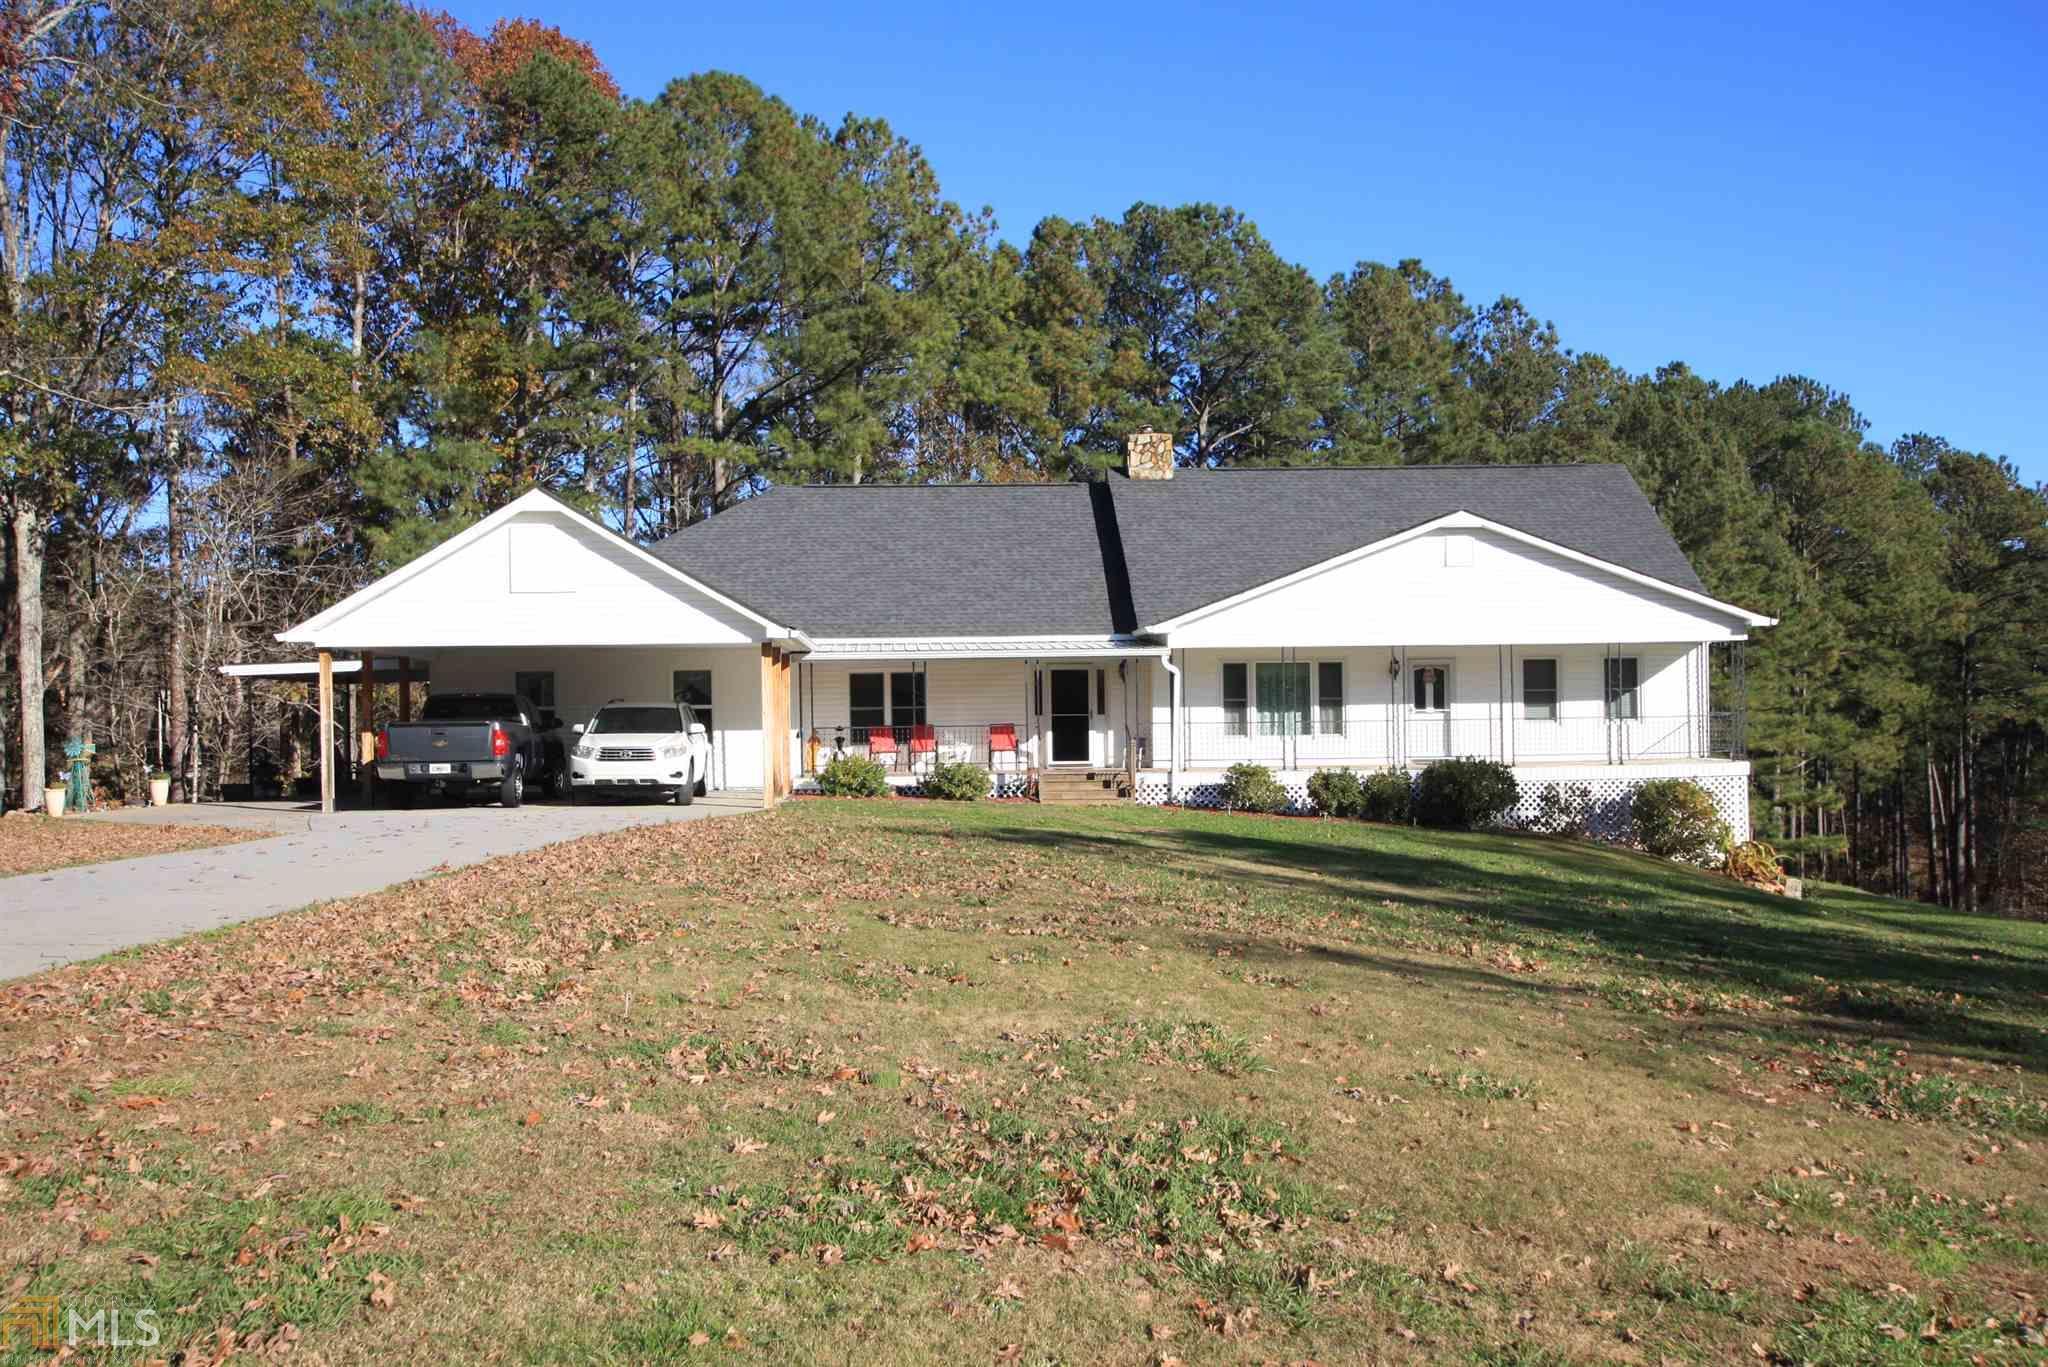 212 Crystal Mountain Rd, Acworth, Georgia 30101, 4 Bedrooms Bedrooms, ,3 BathroomsBathrooms,Single Family,For Sale,212 Crystal Mountain Rd,2,8897490